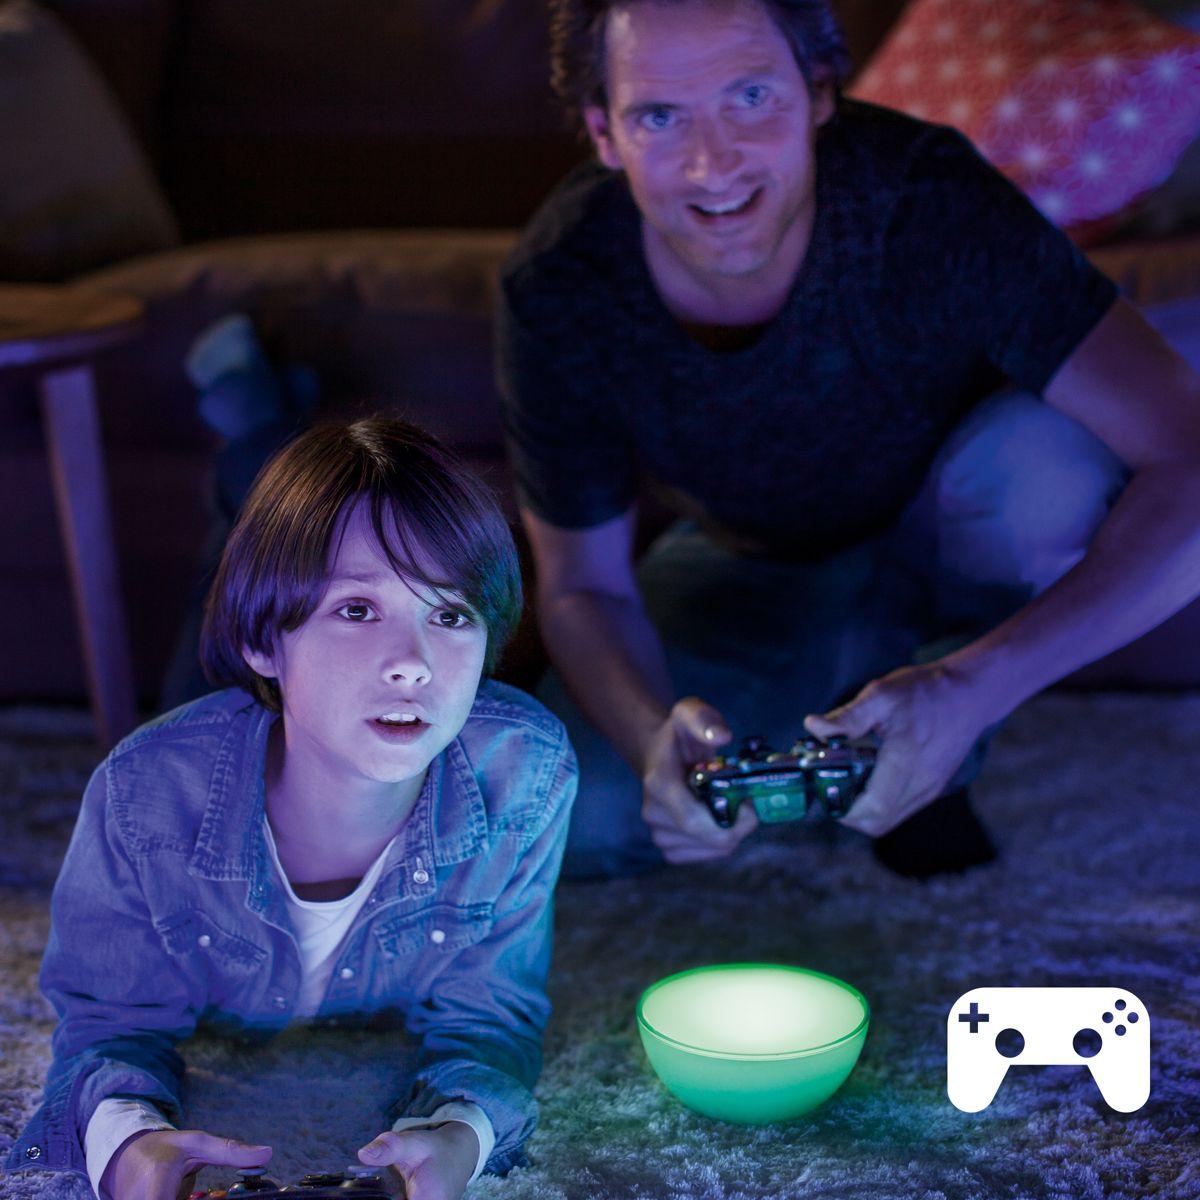 Ilumina tus juegos